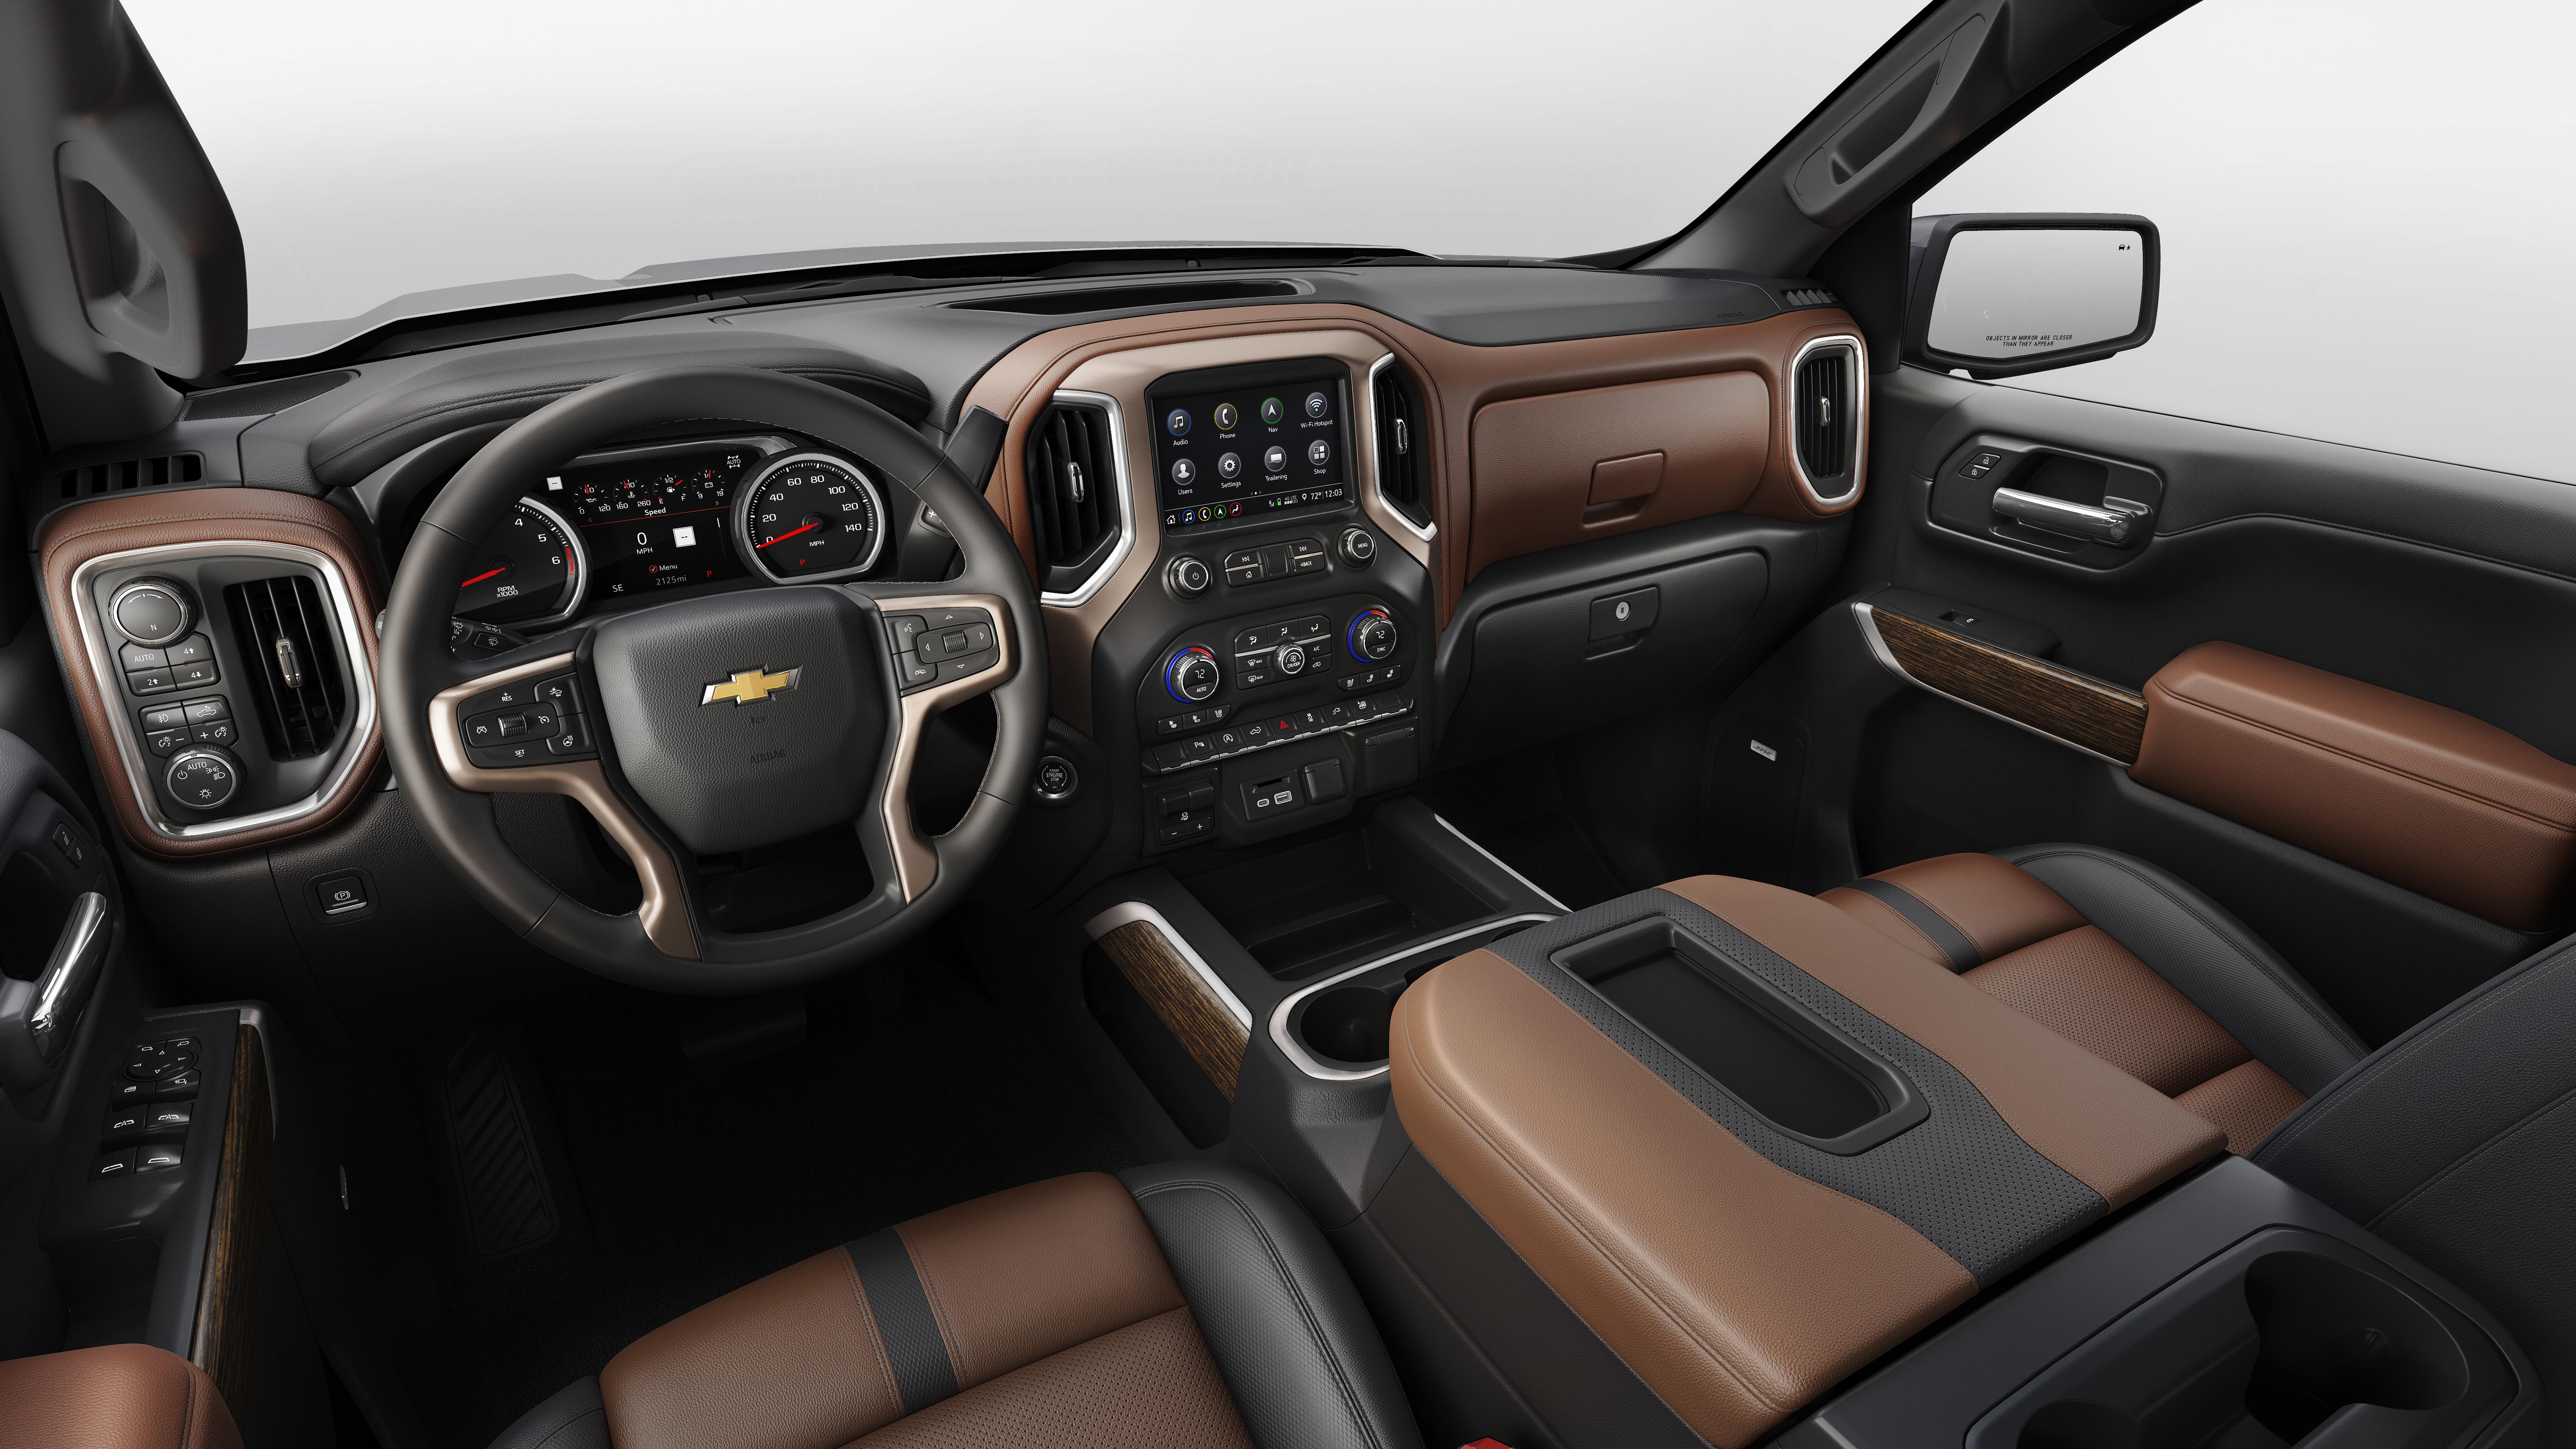 Gmc Sierra Accessories 2017 >> Meet Chevy's 2019 Adventure Truck: Silverado Grows 'Wings'